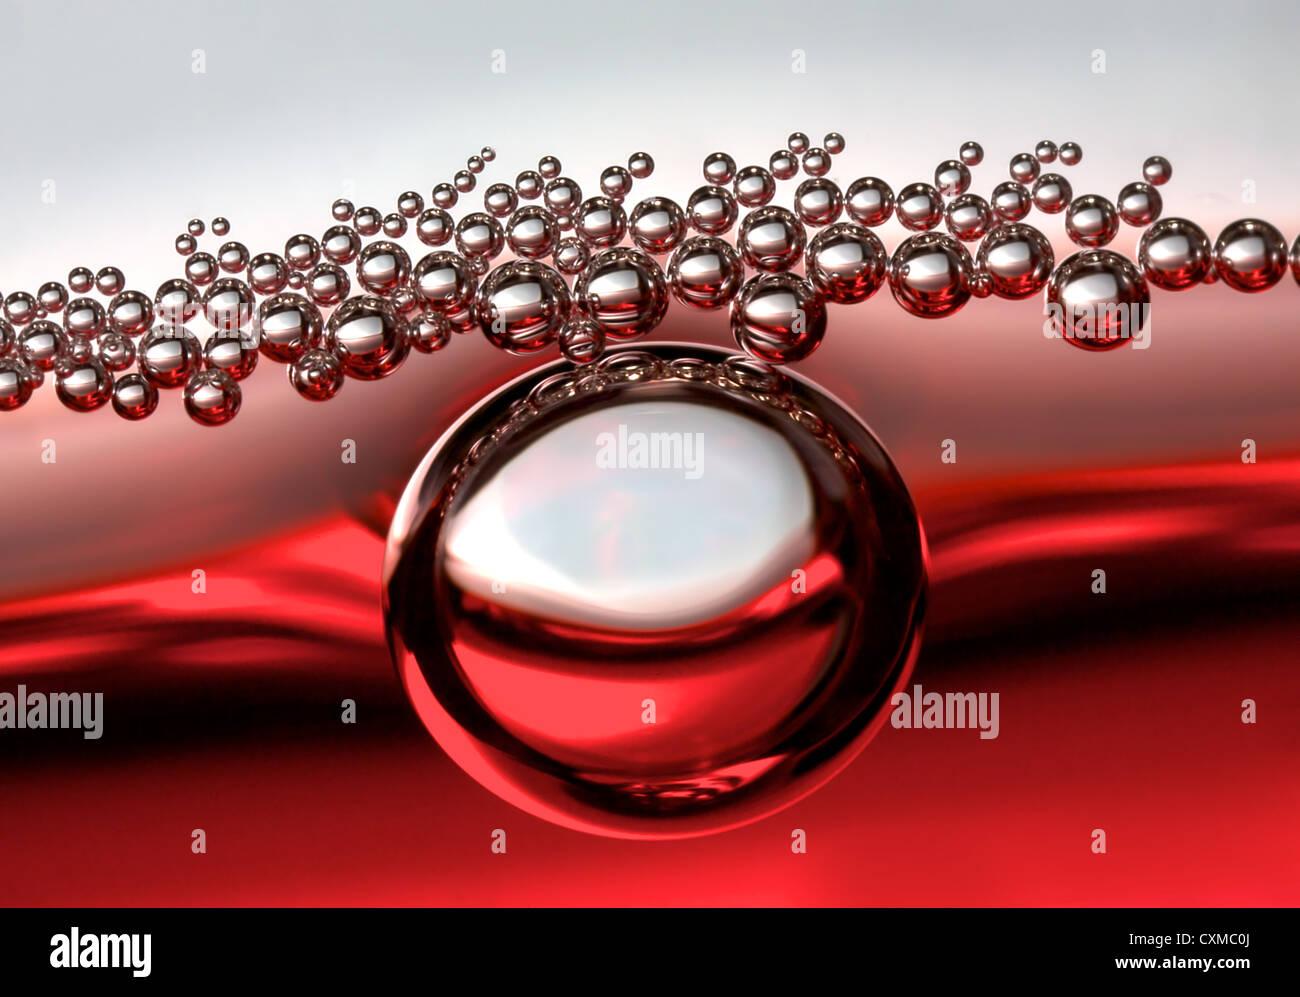 a single bubble followed by smaller bubbles - Stock Image